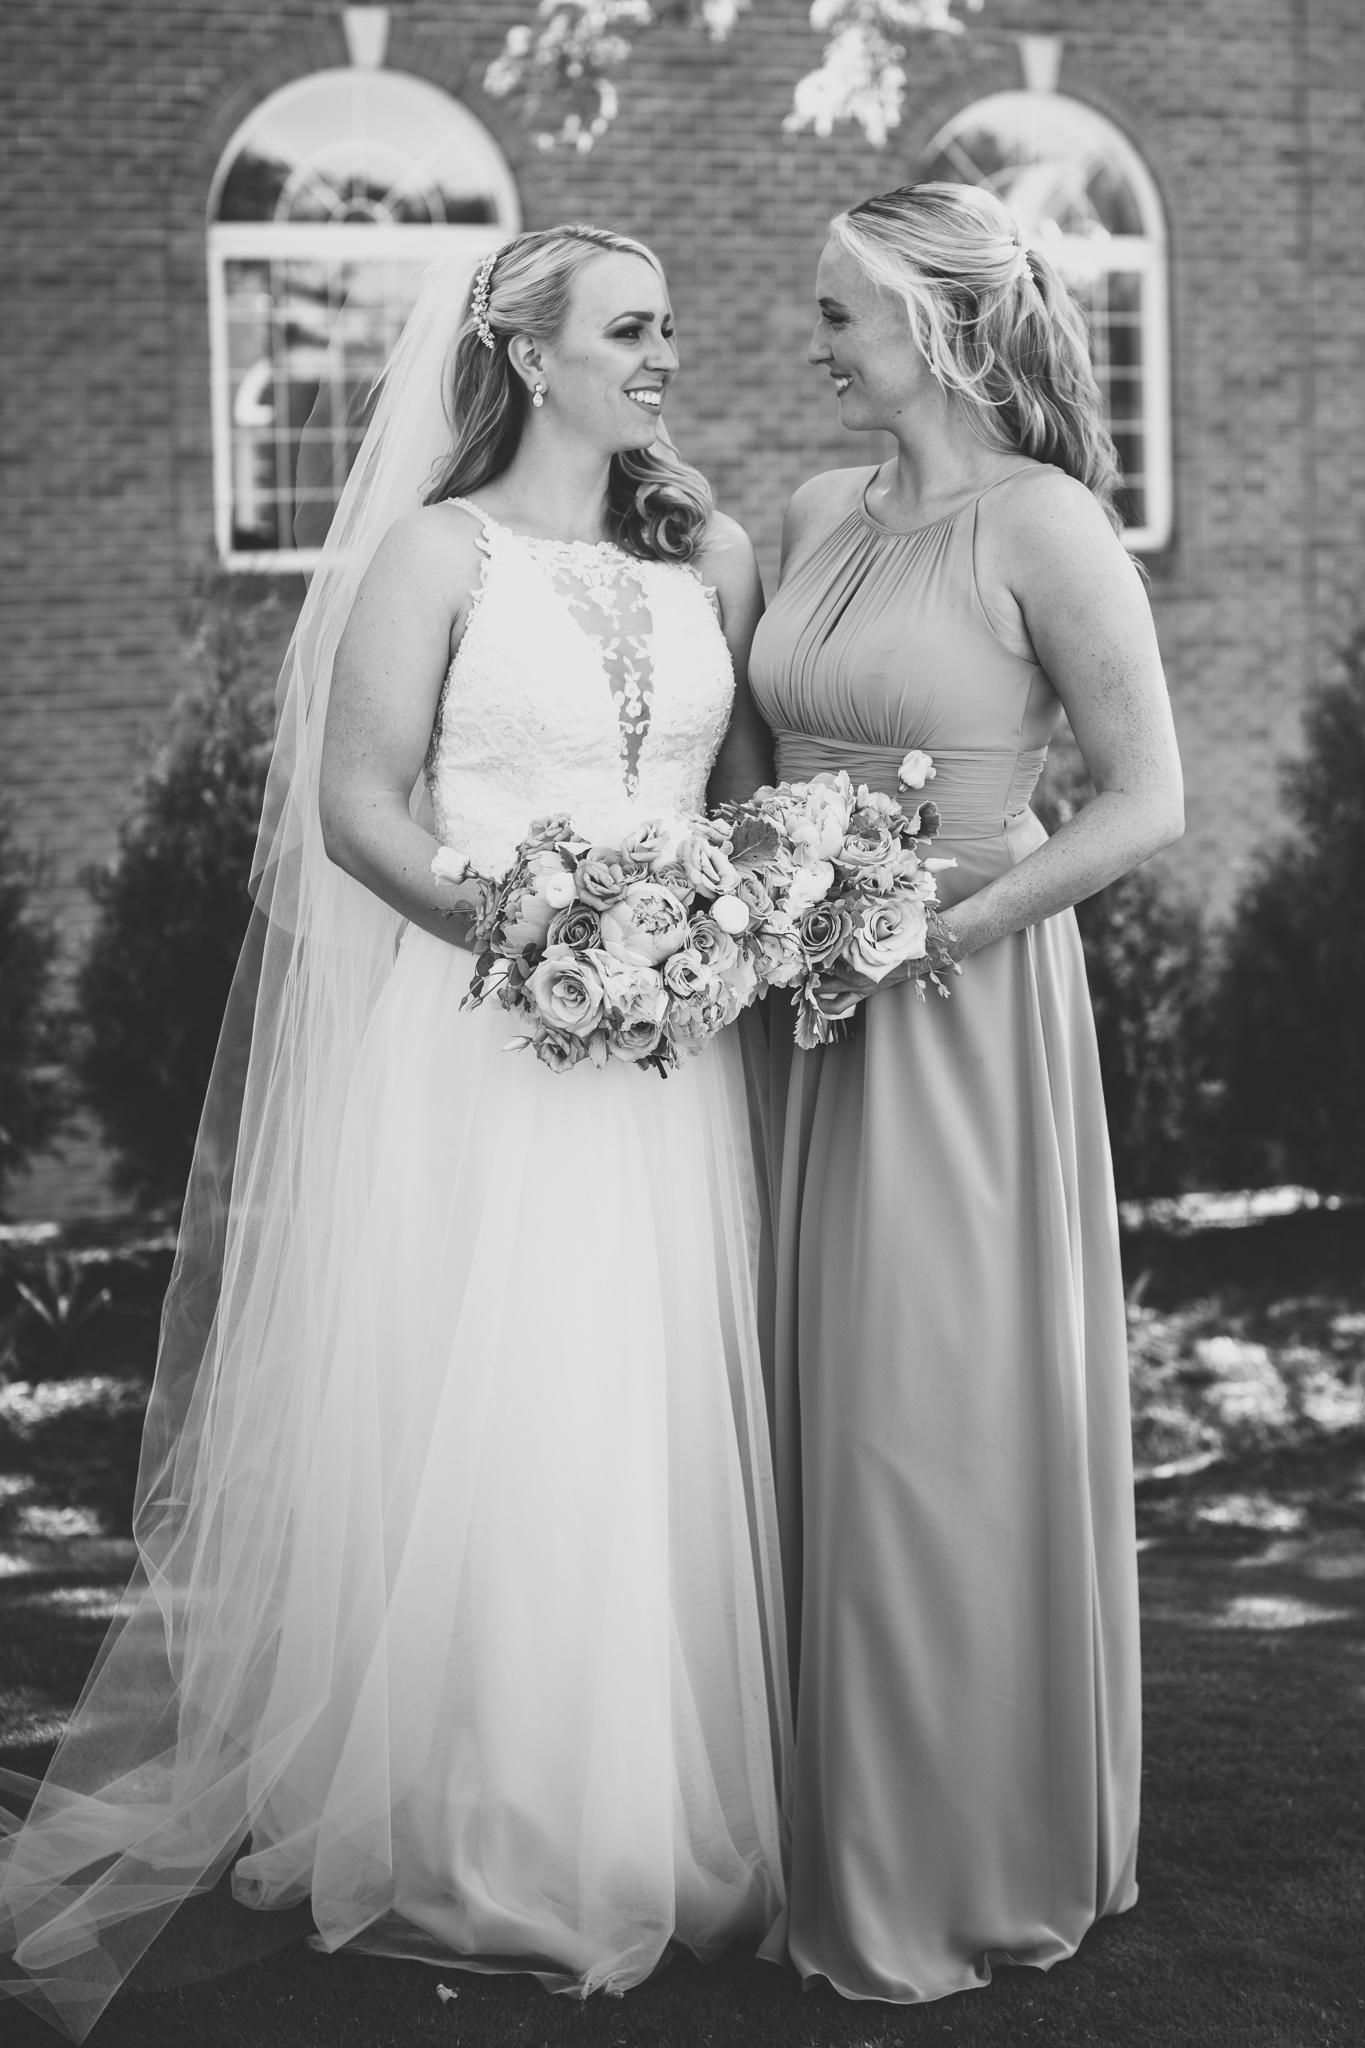 043-best-detroit-michigan-outdoor-wedding-photographer.jpg